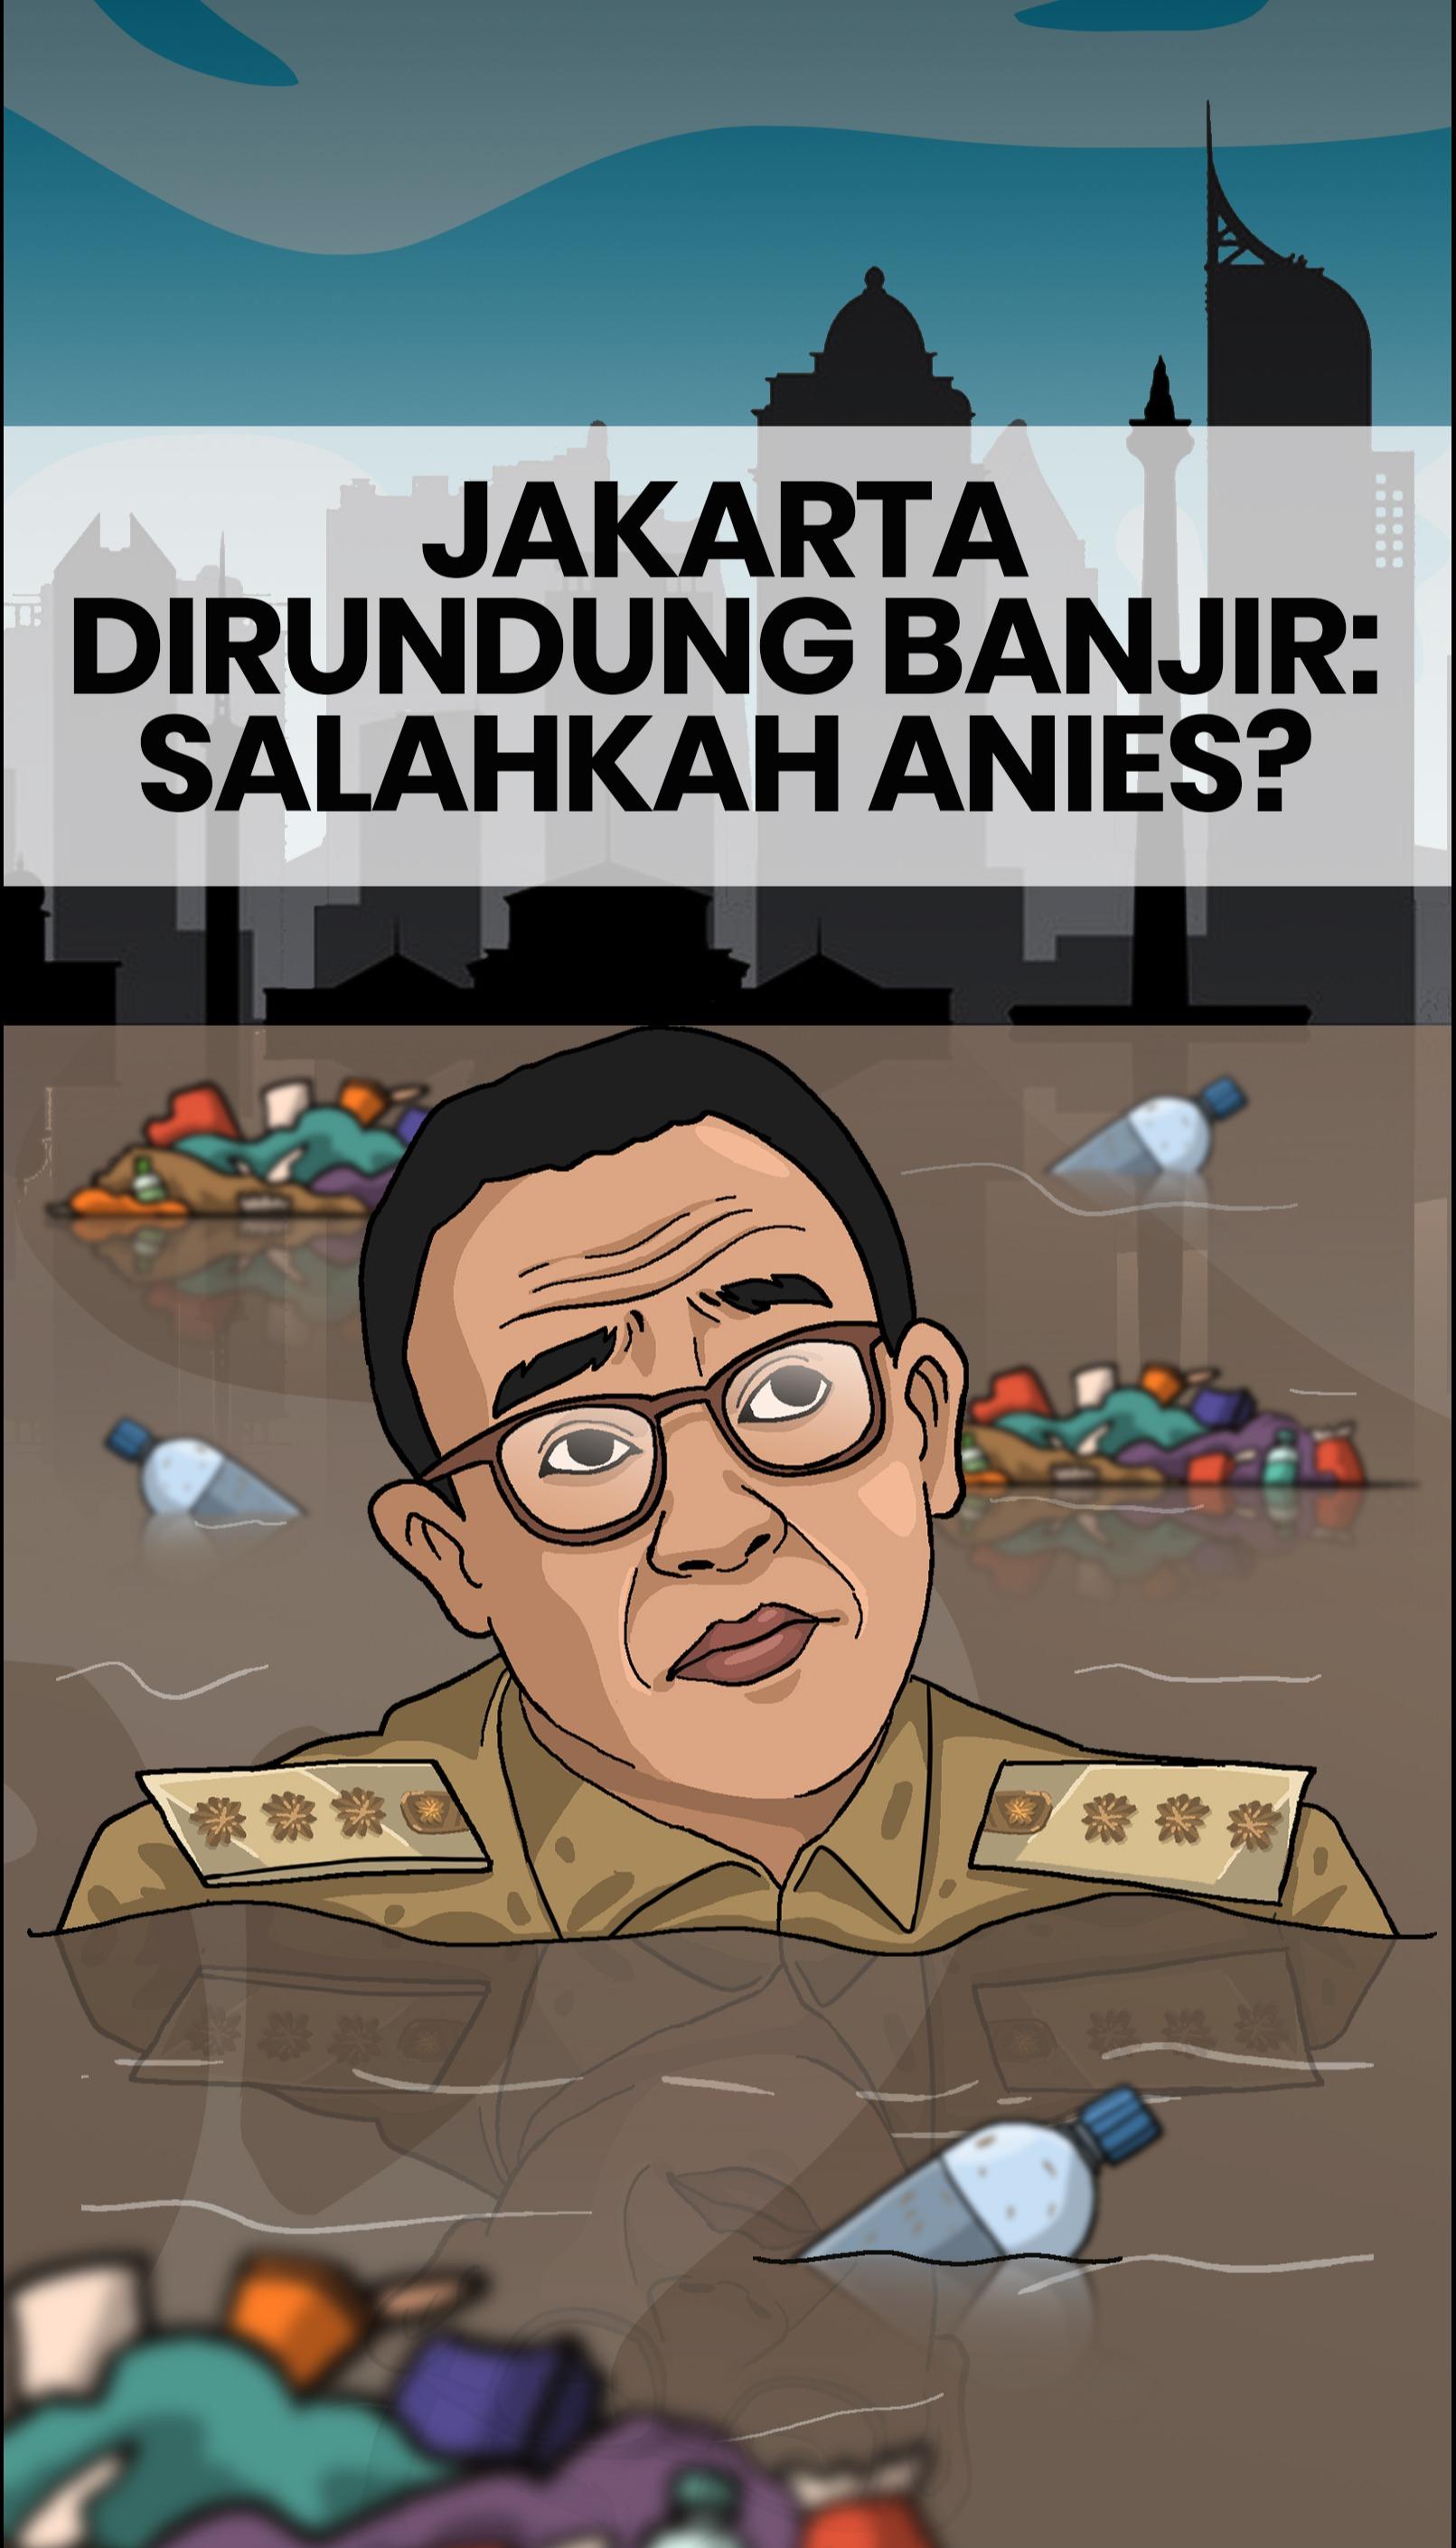 Jakarta Dirundung Banjir: Salahkah Anies?